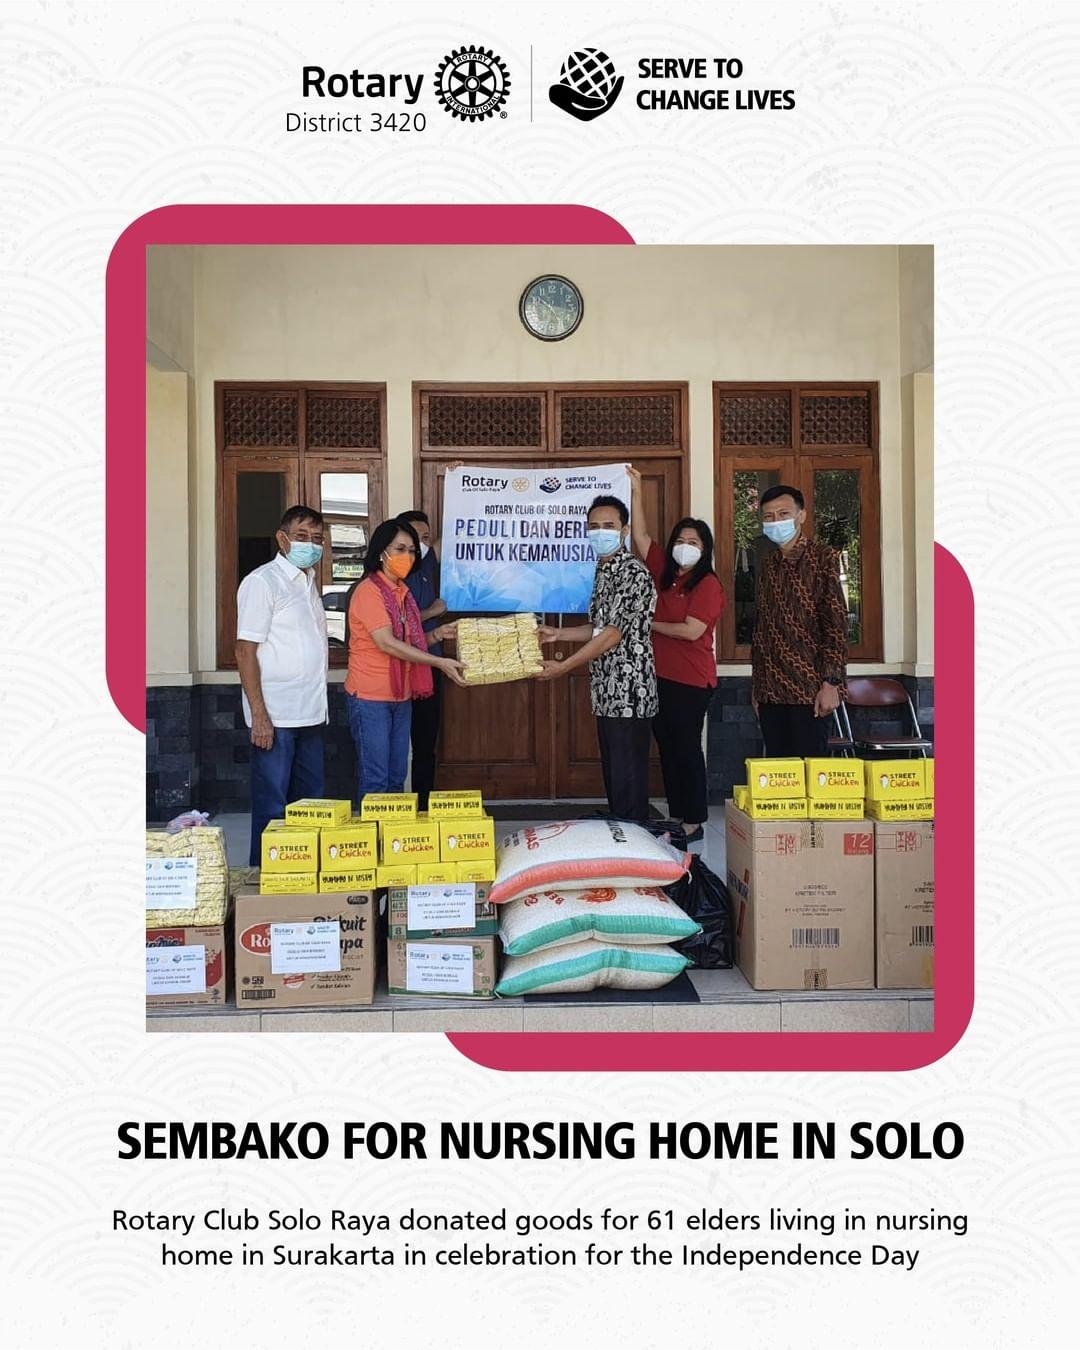 Sembako for Nursing Home in Solo